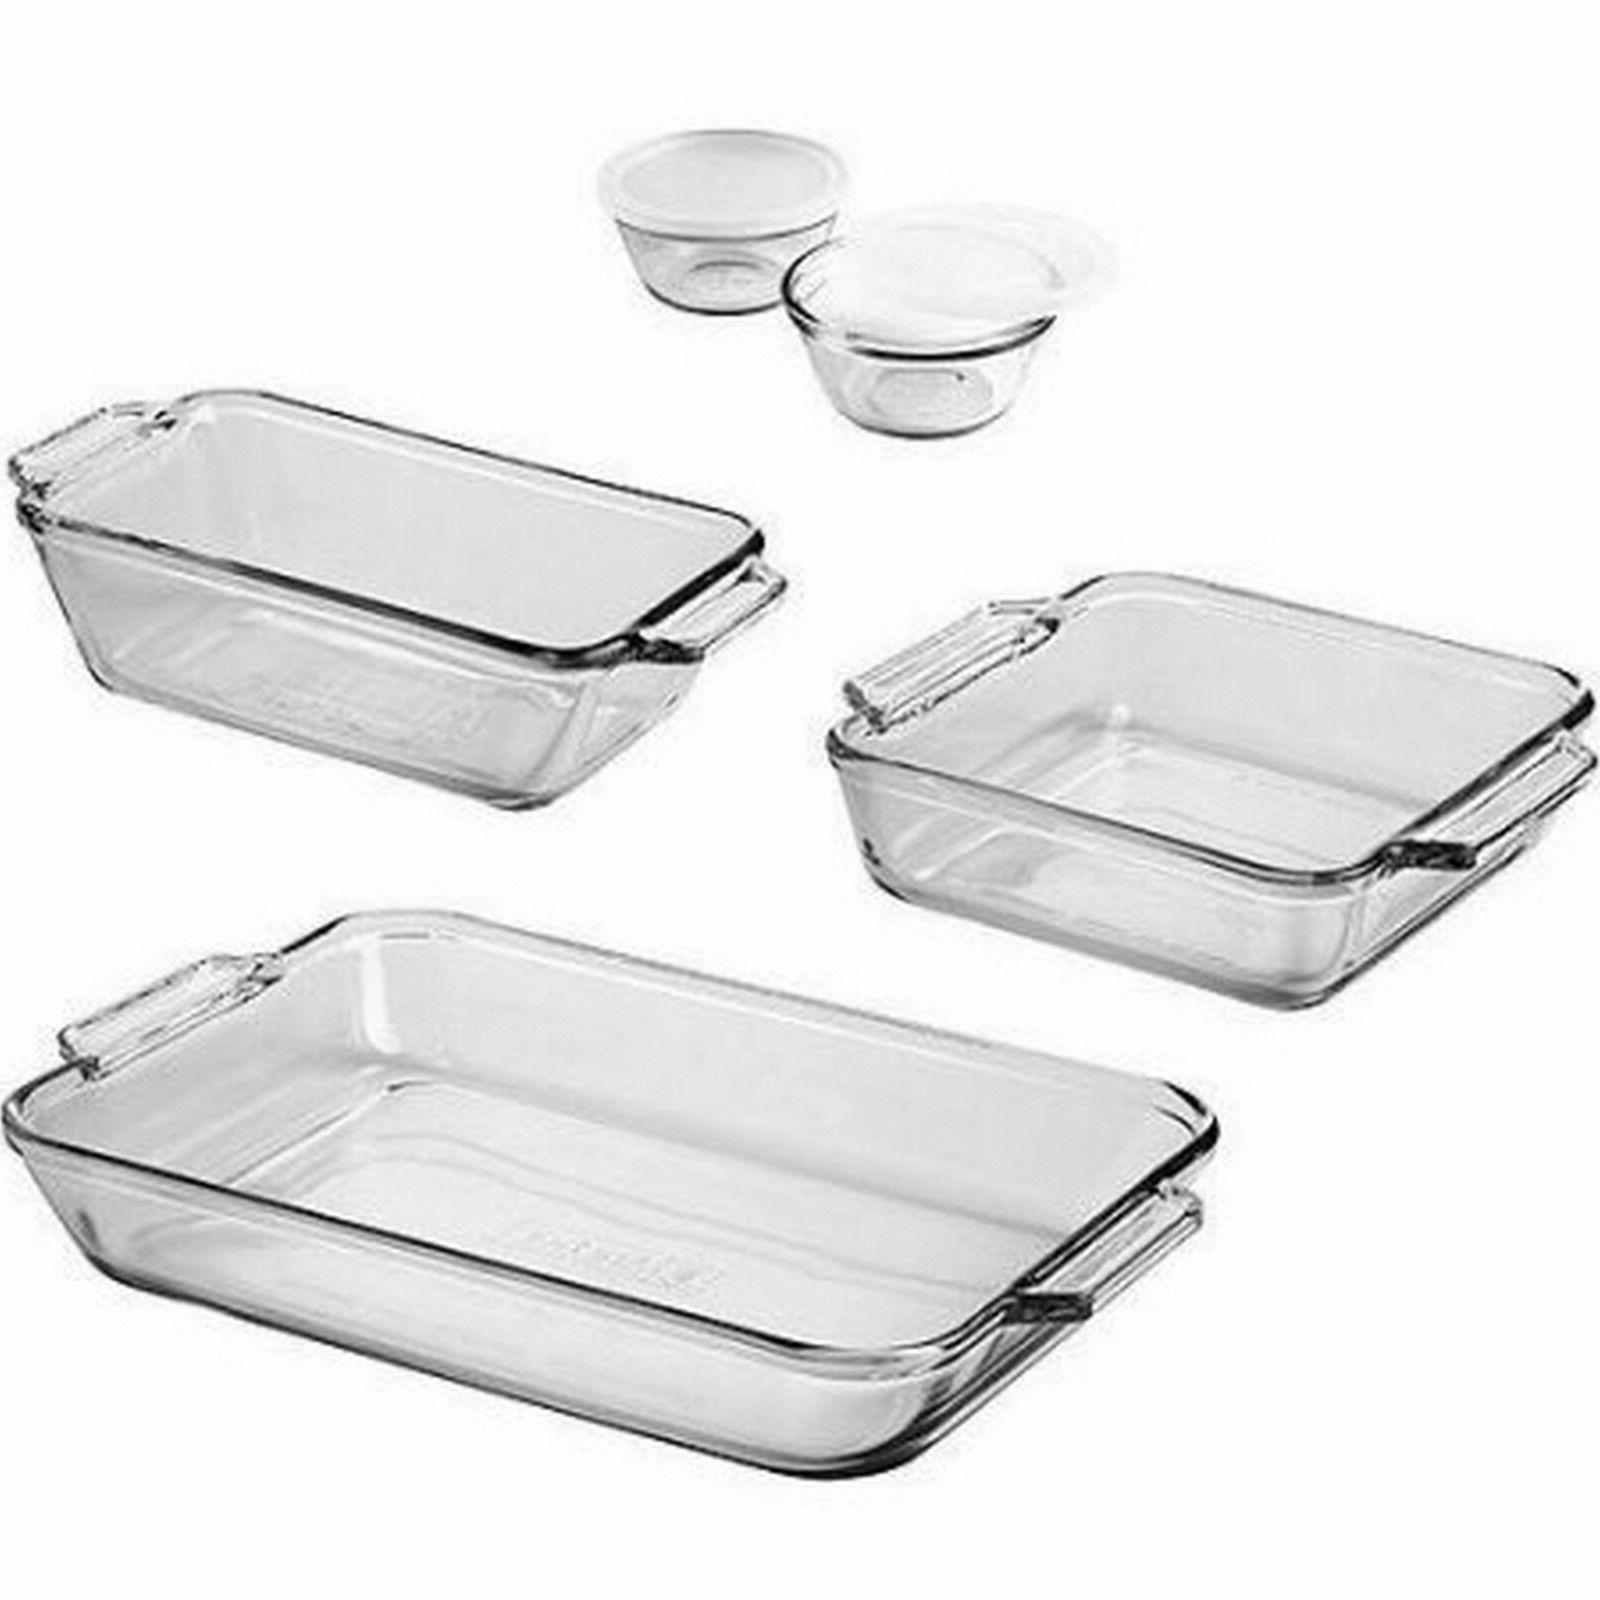 Glass Pan Baking Set Bakeware Pans Cups 7-Piece Loaf Cake Cu